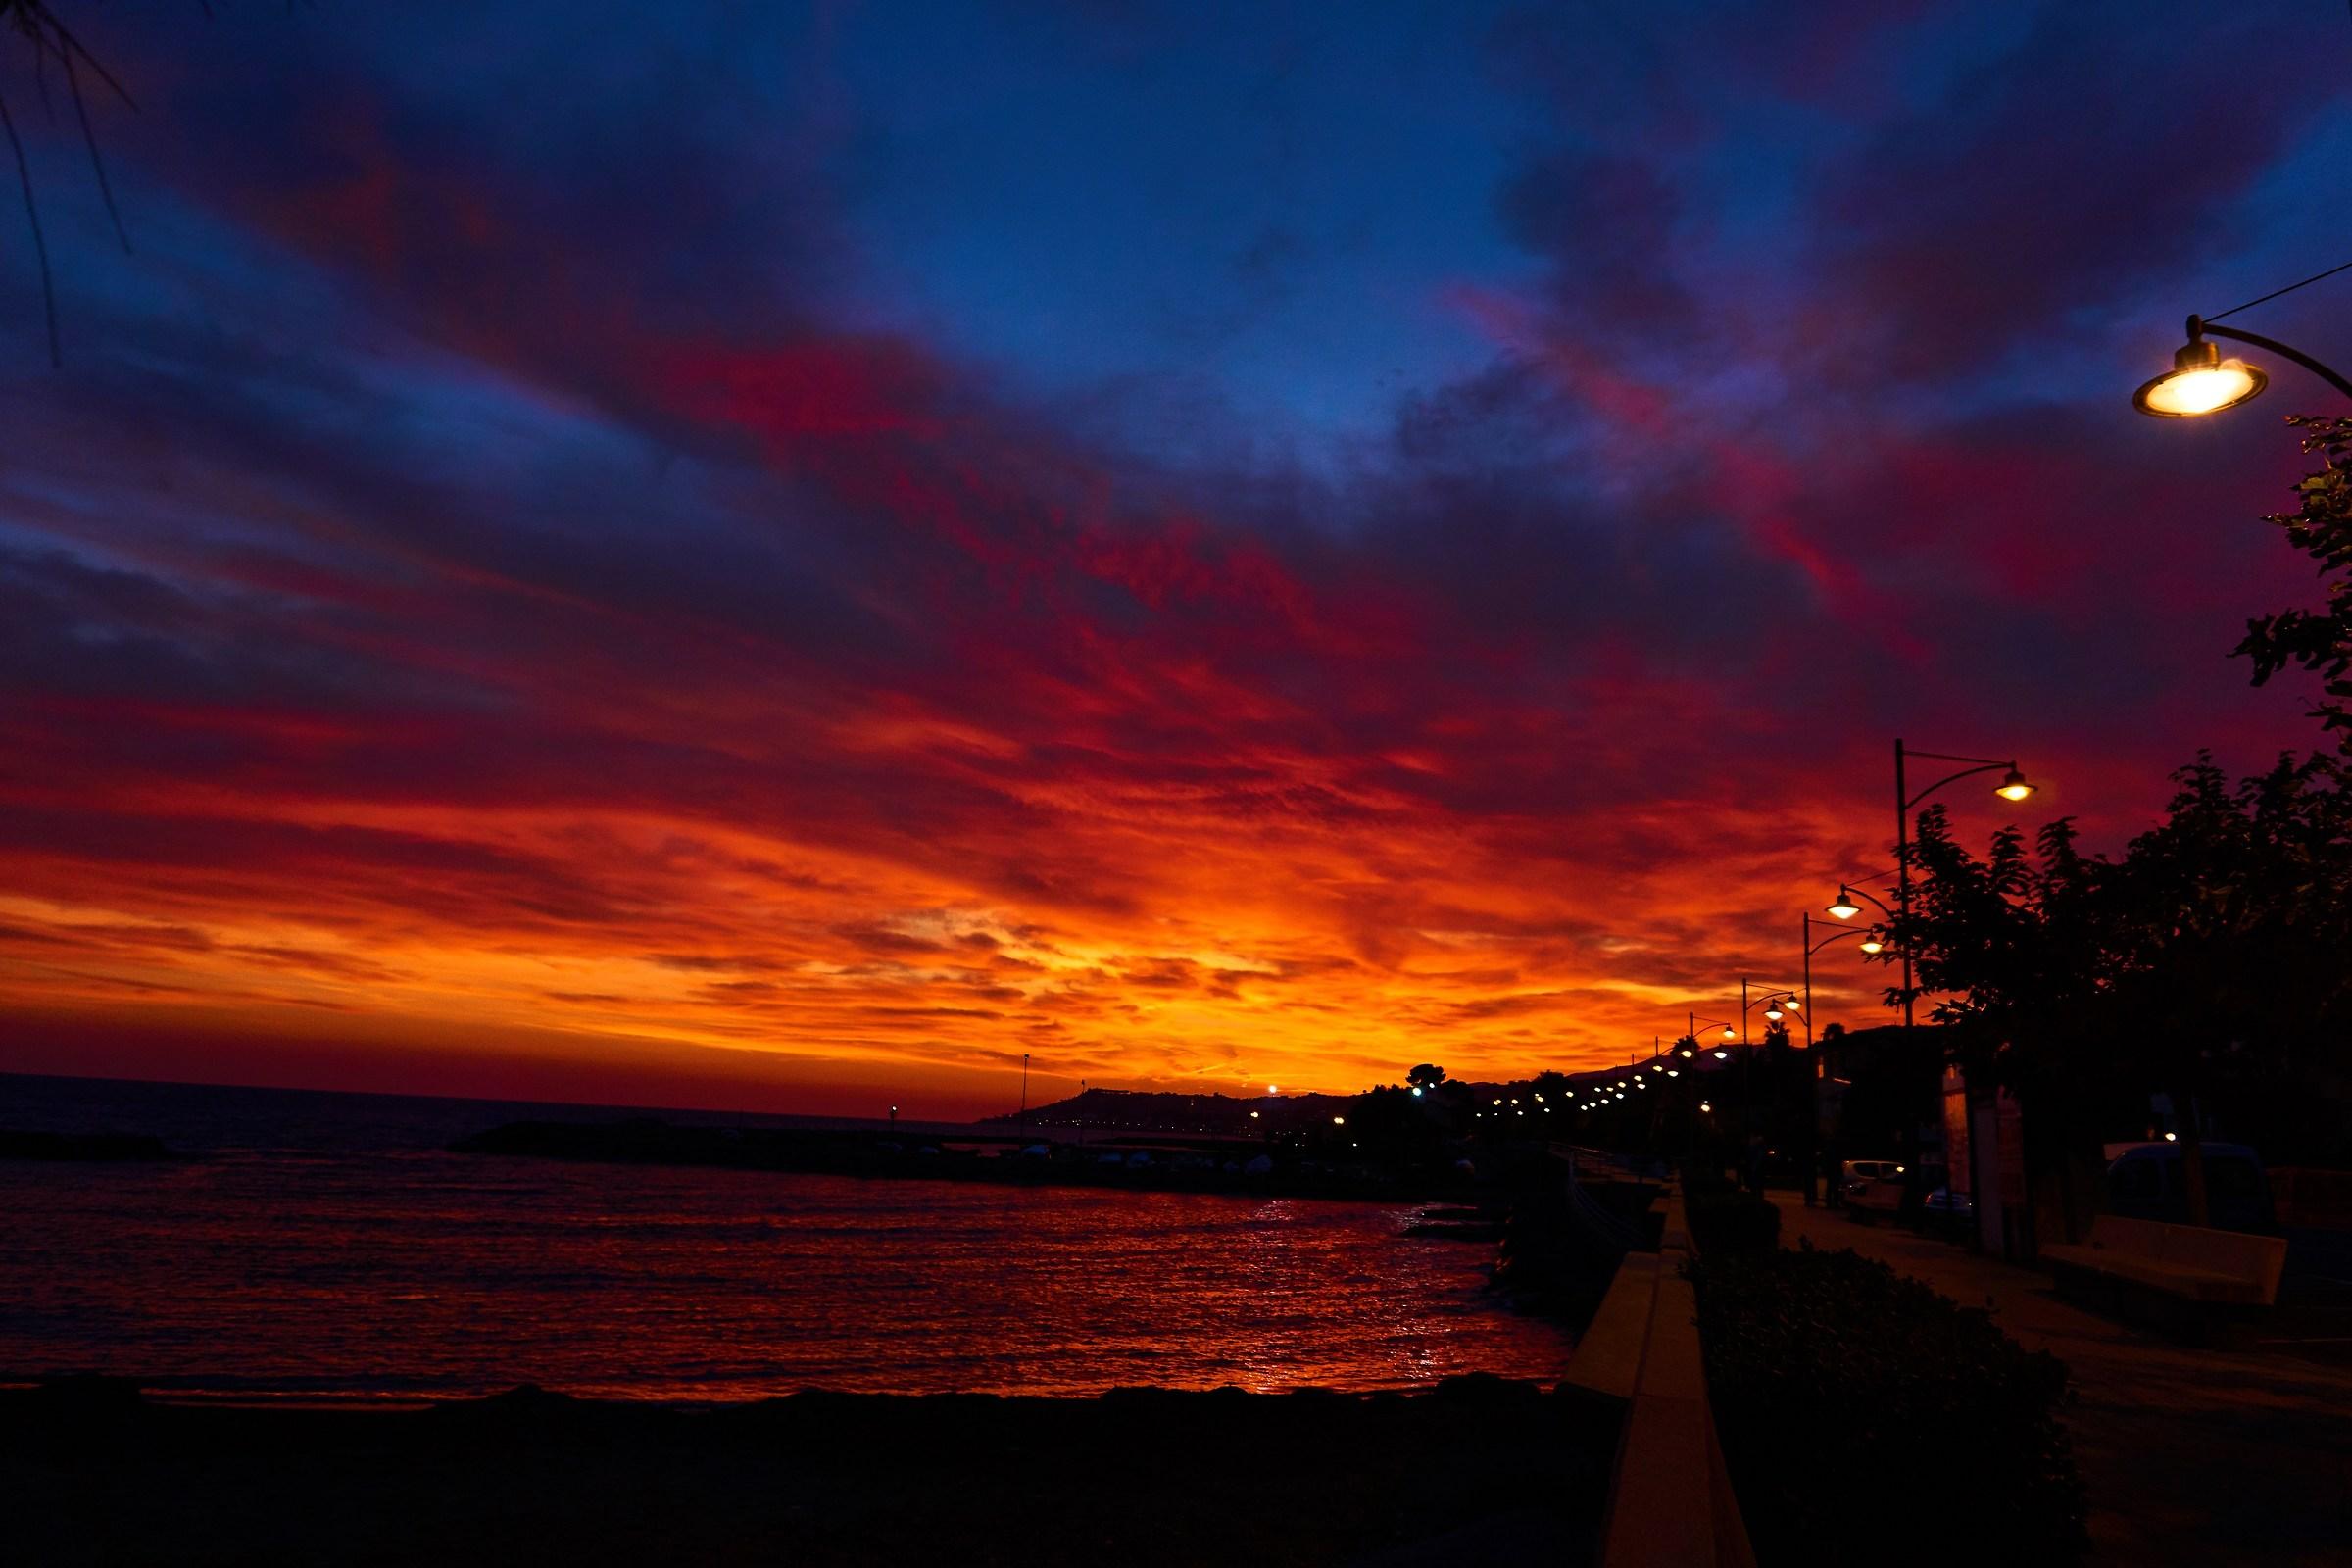 sunset at stefano saint...